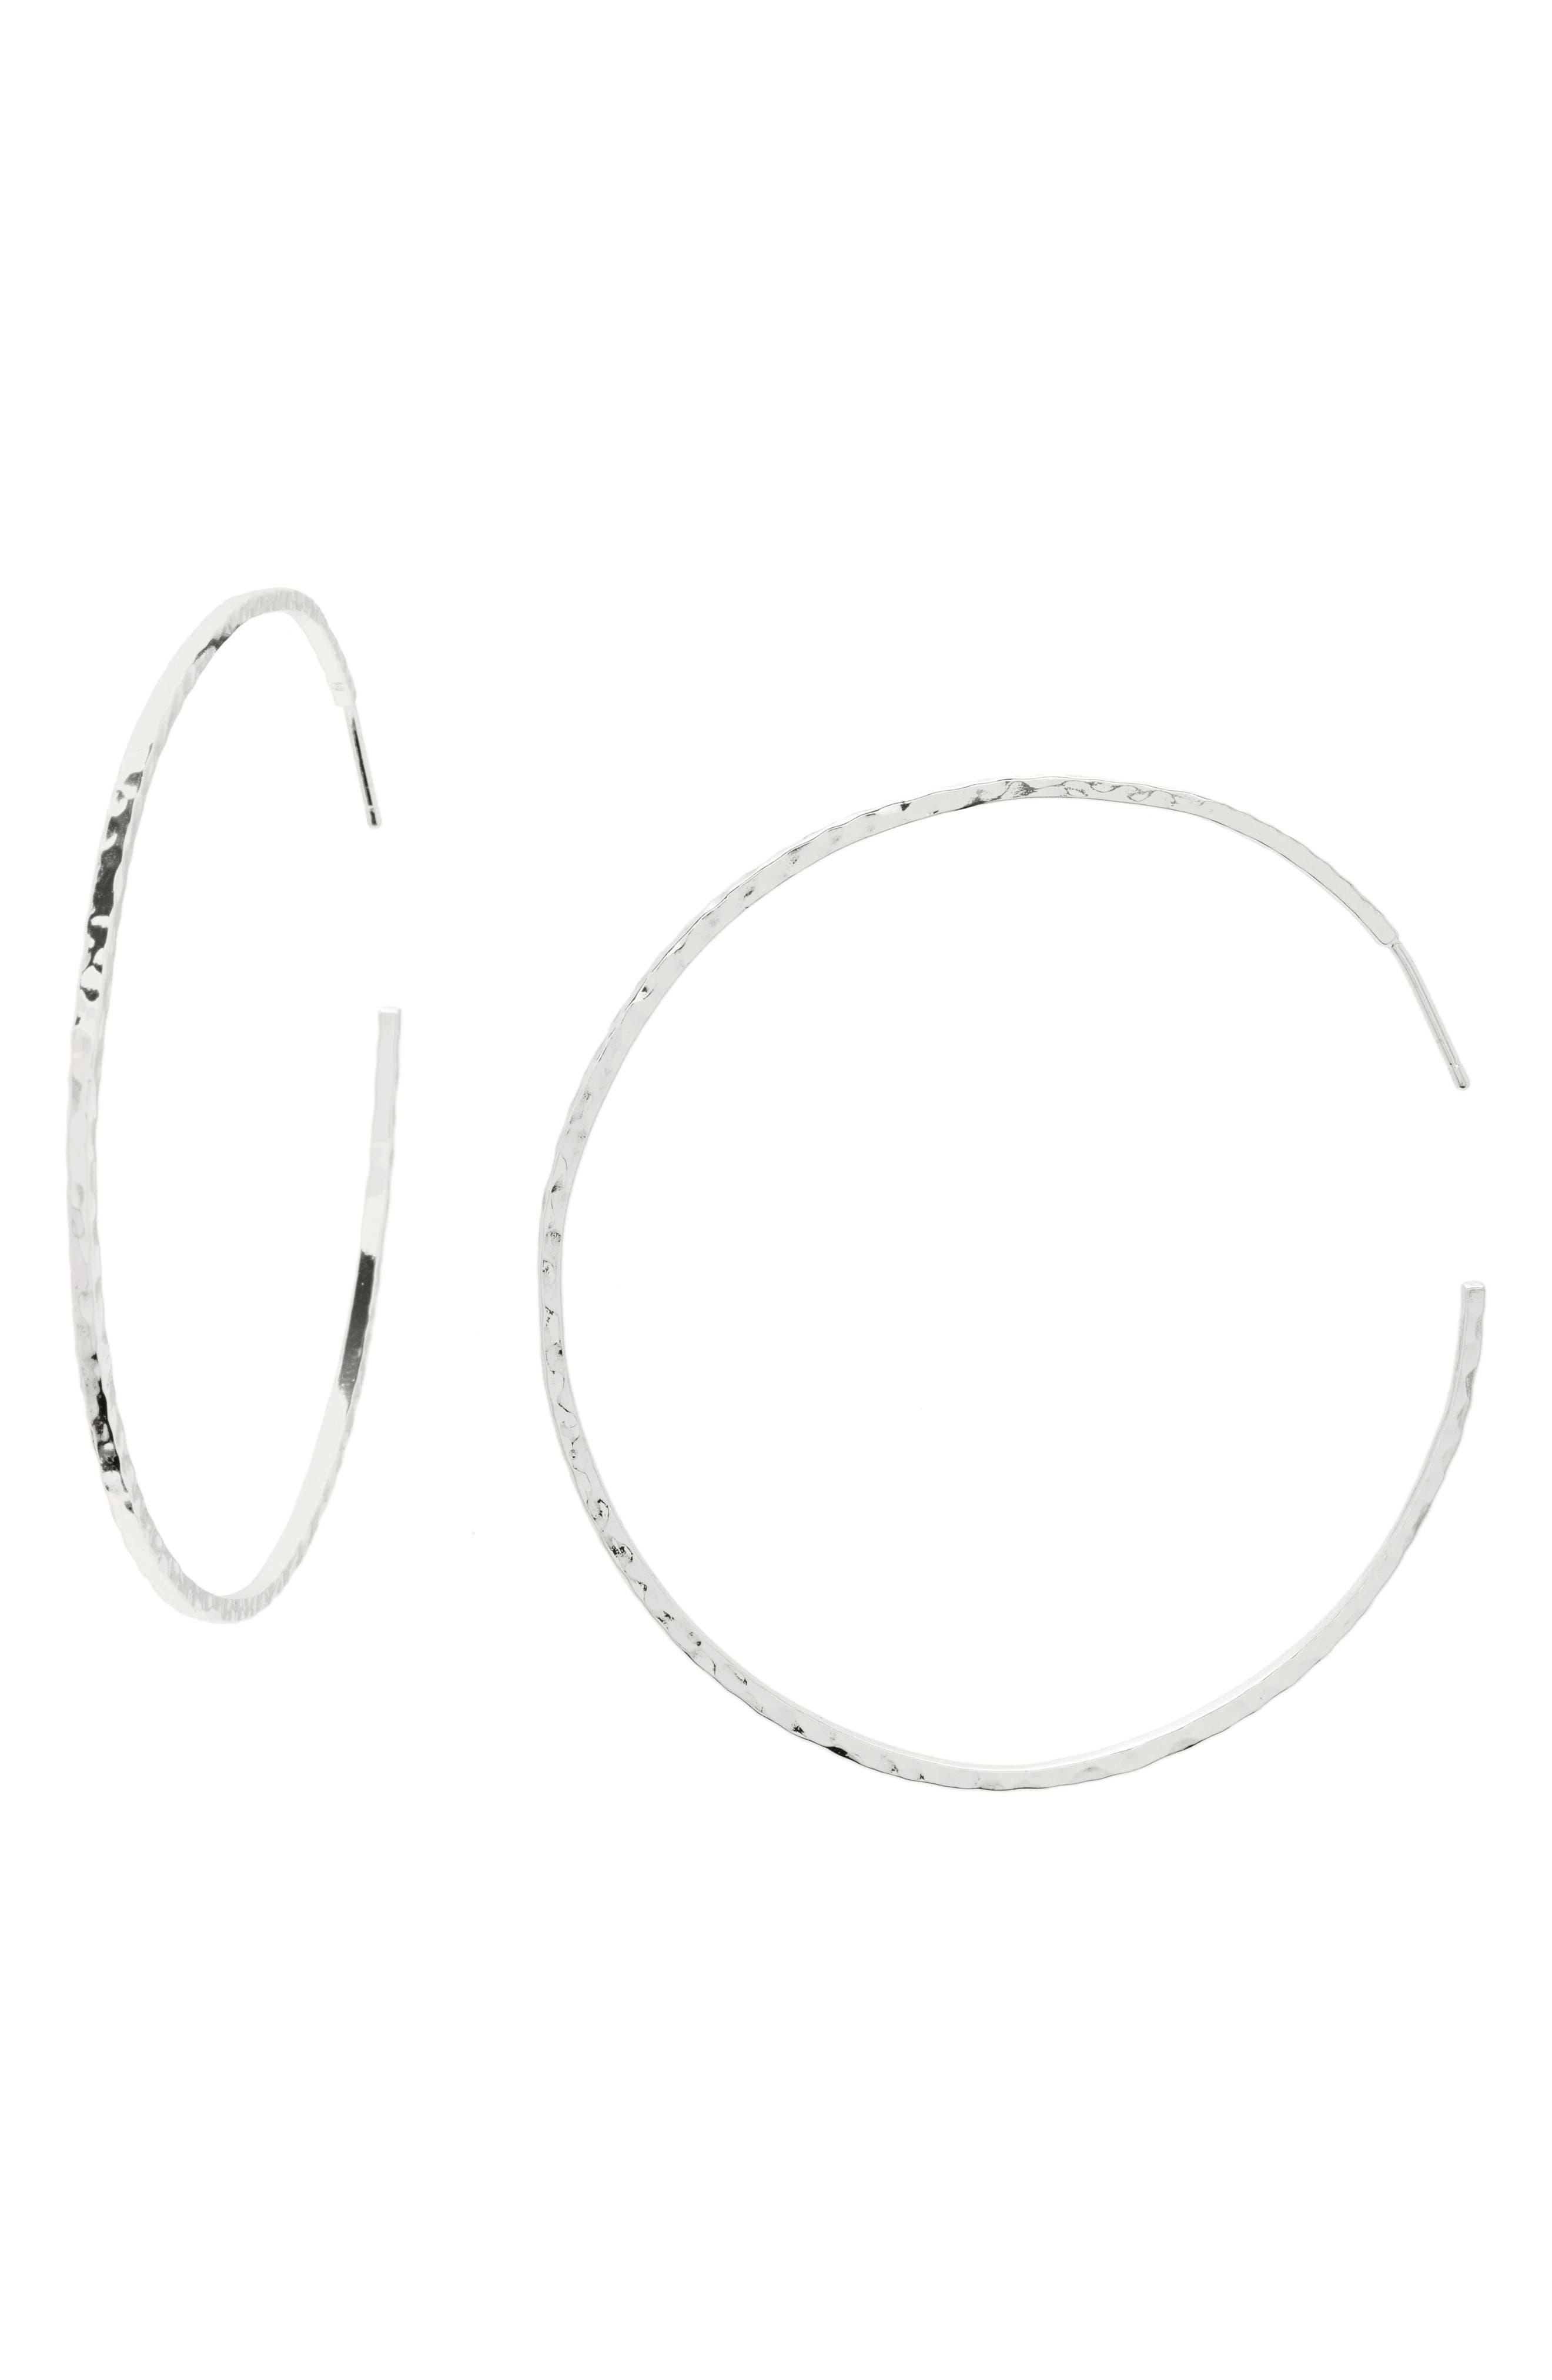 GORJANA Taner Extra Large Hoop Earrings, Main, color, SILVER